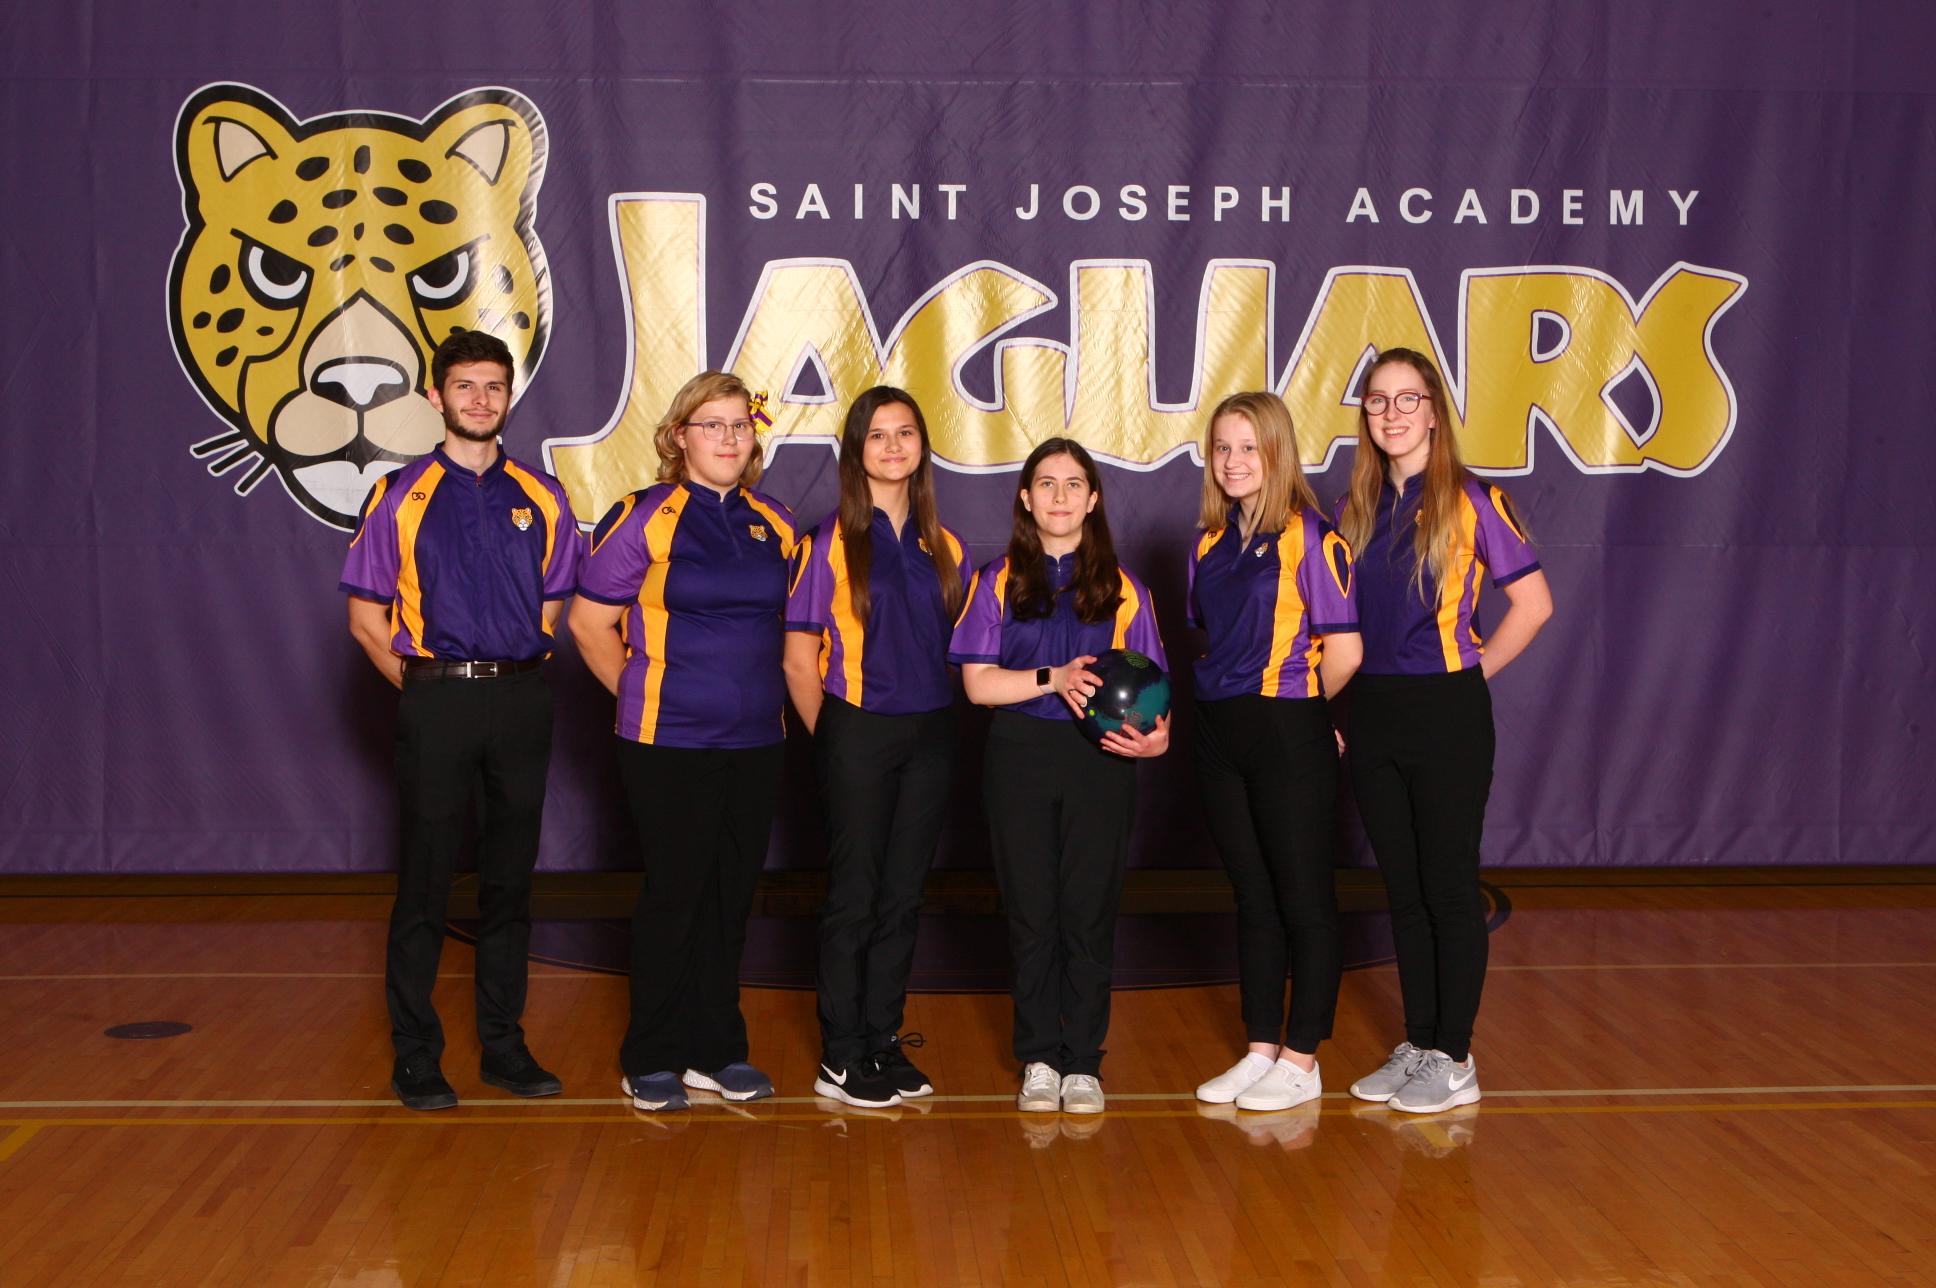 Saint Joseph Academy Team Home Saint Joseph Academy Jaguars Sports